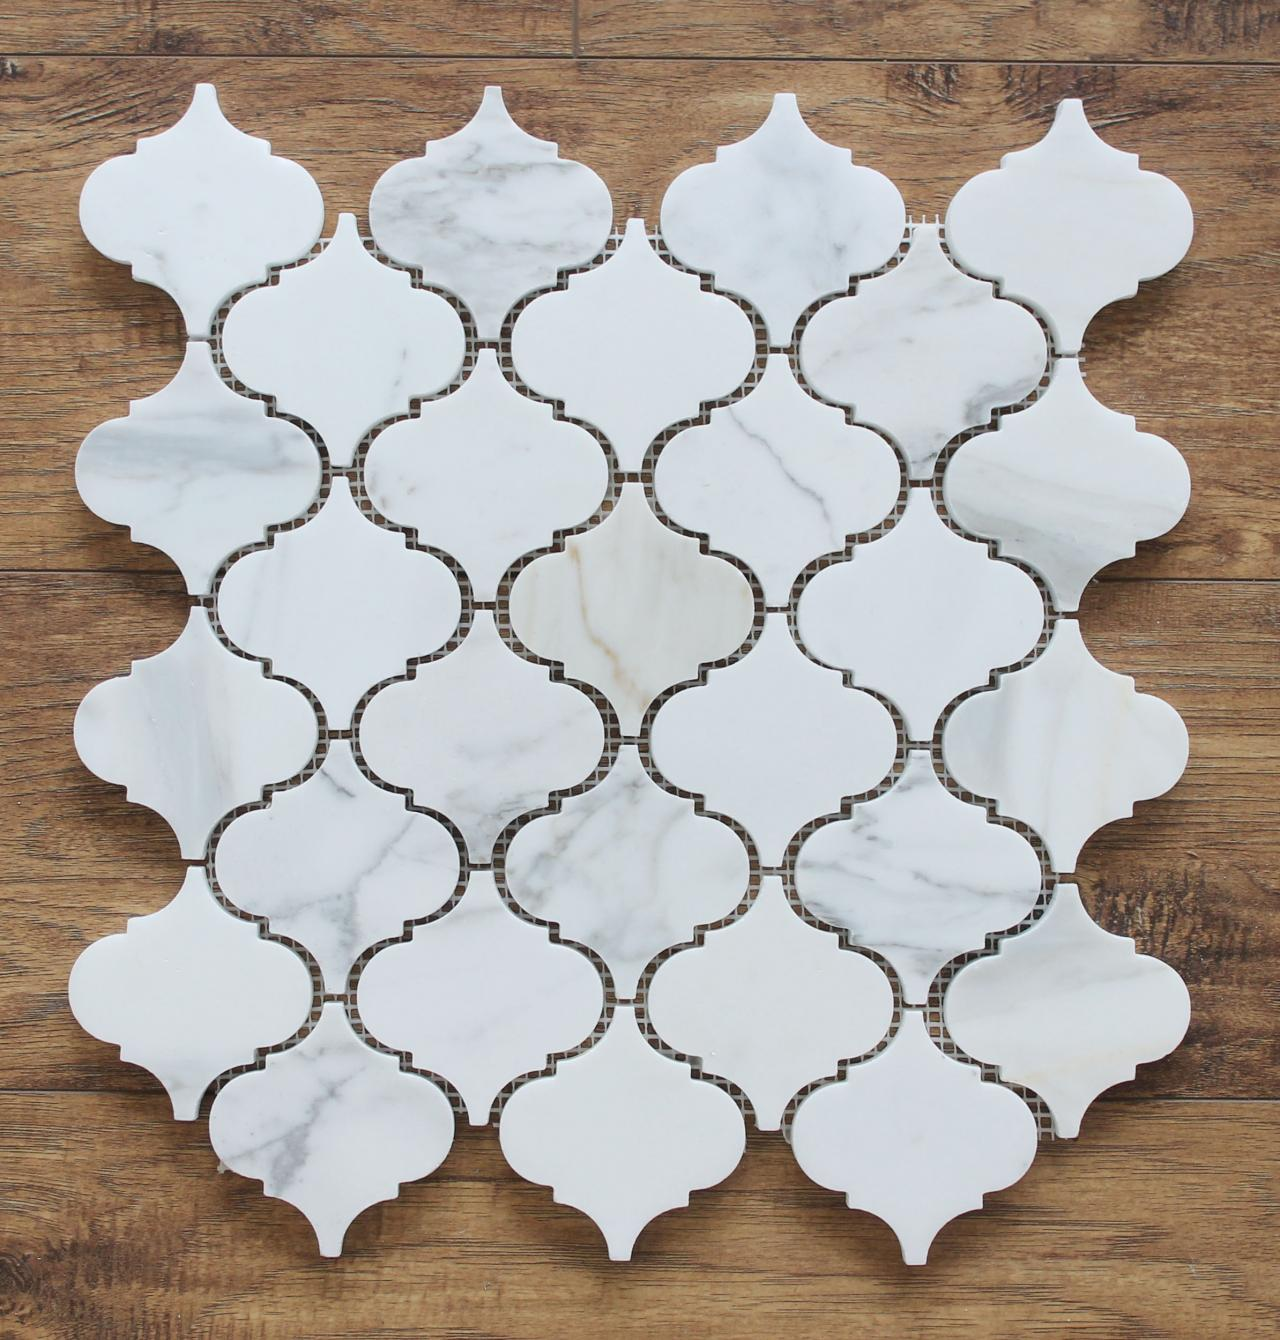 Arabesque Tiles Kitchen Wall: Calacatta Gold Polished Marble Arabesque Mosaic Tiles